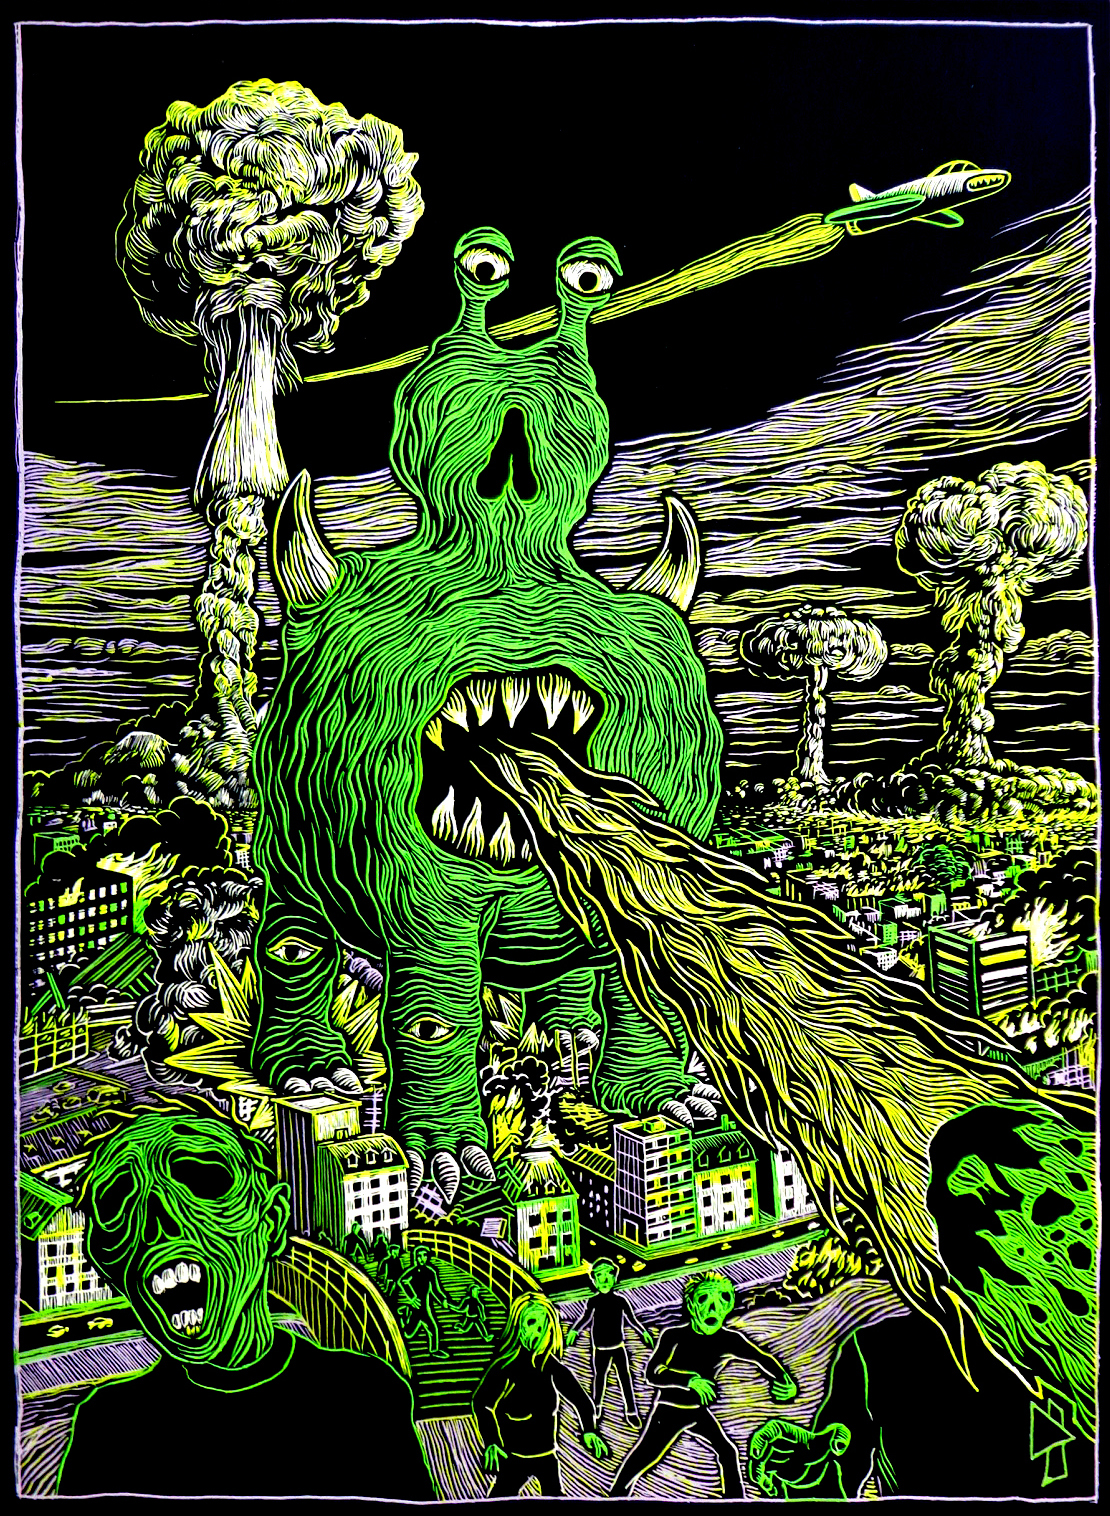 Tomahawk - Apocalypse